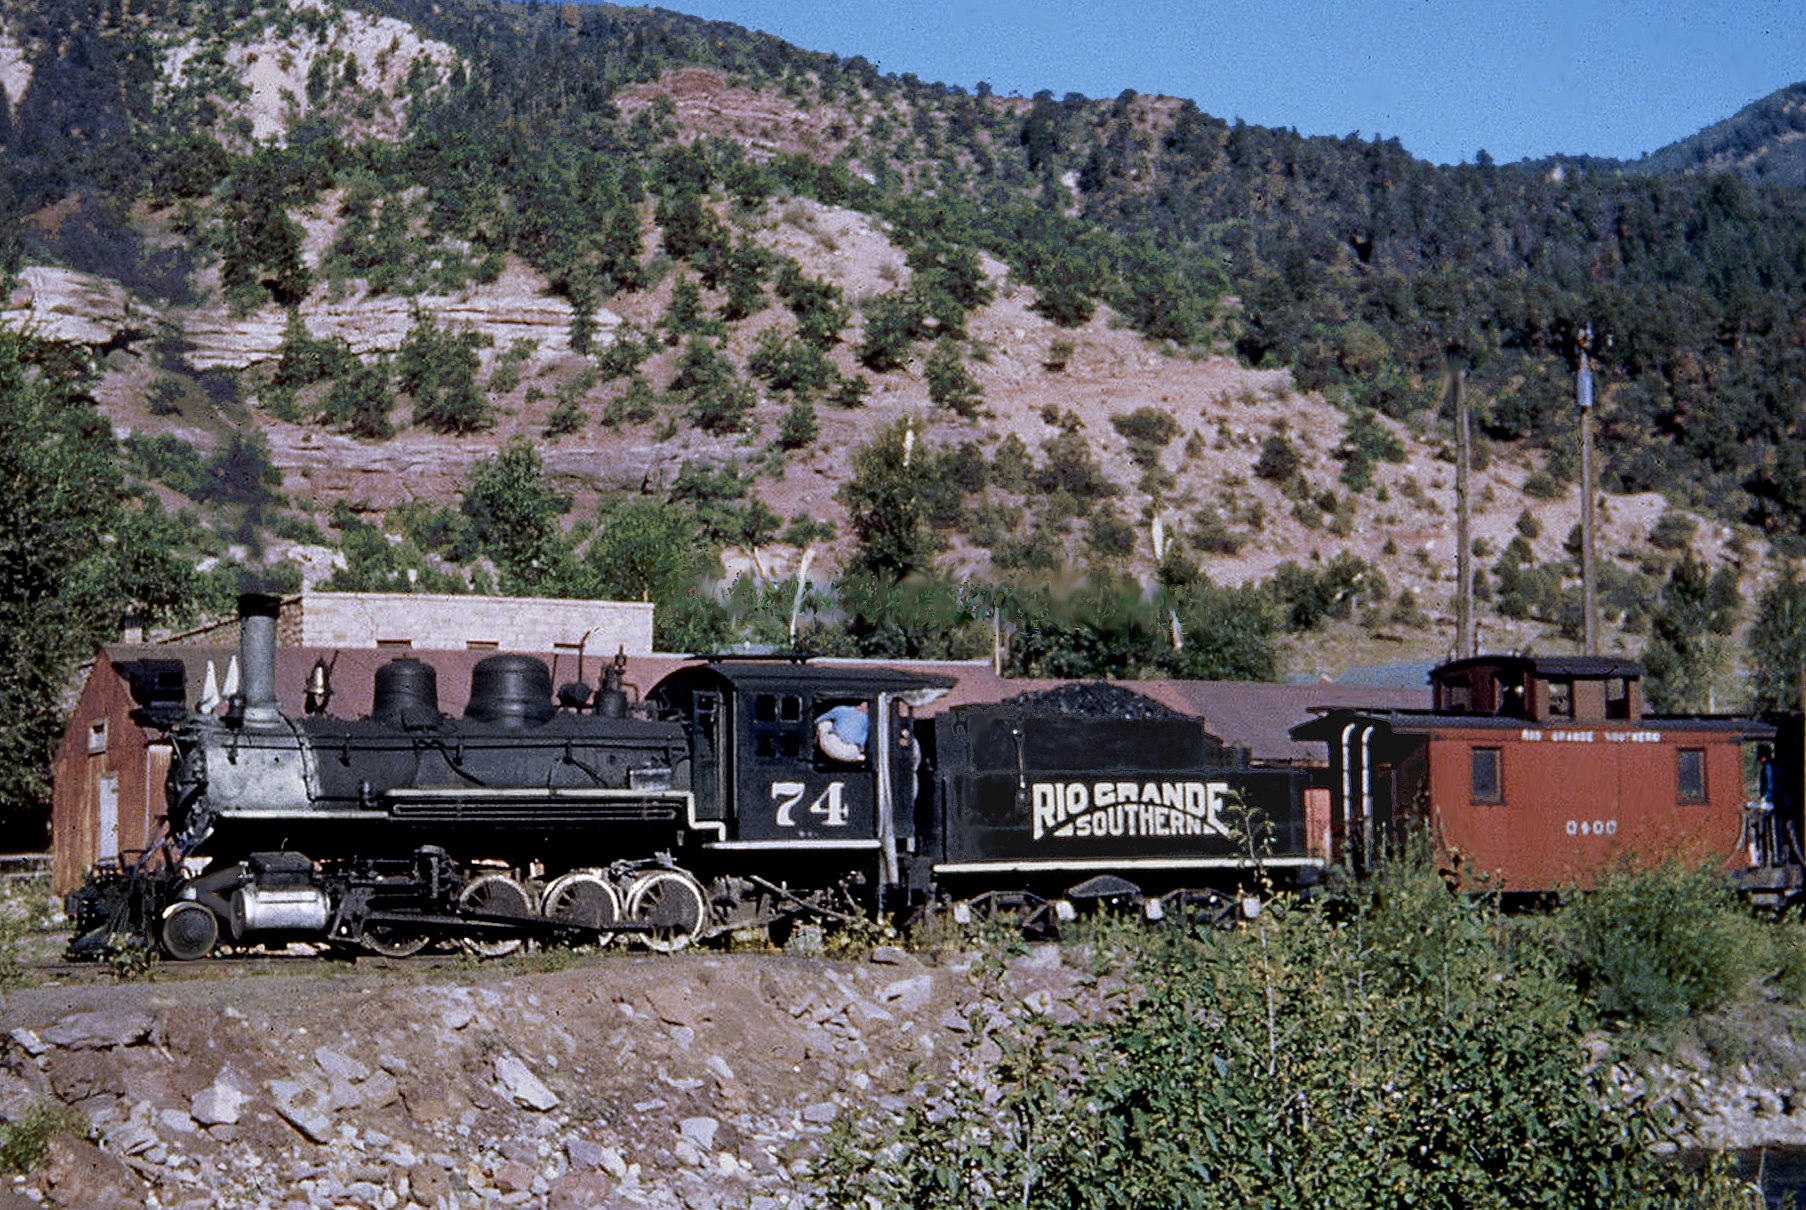 RGS 74 a 2-8-0 w caboose scene.jpg